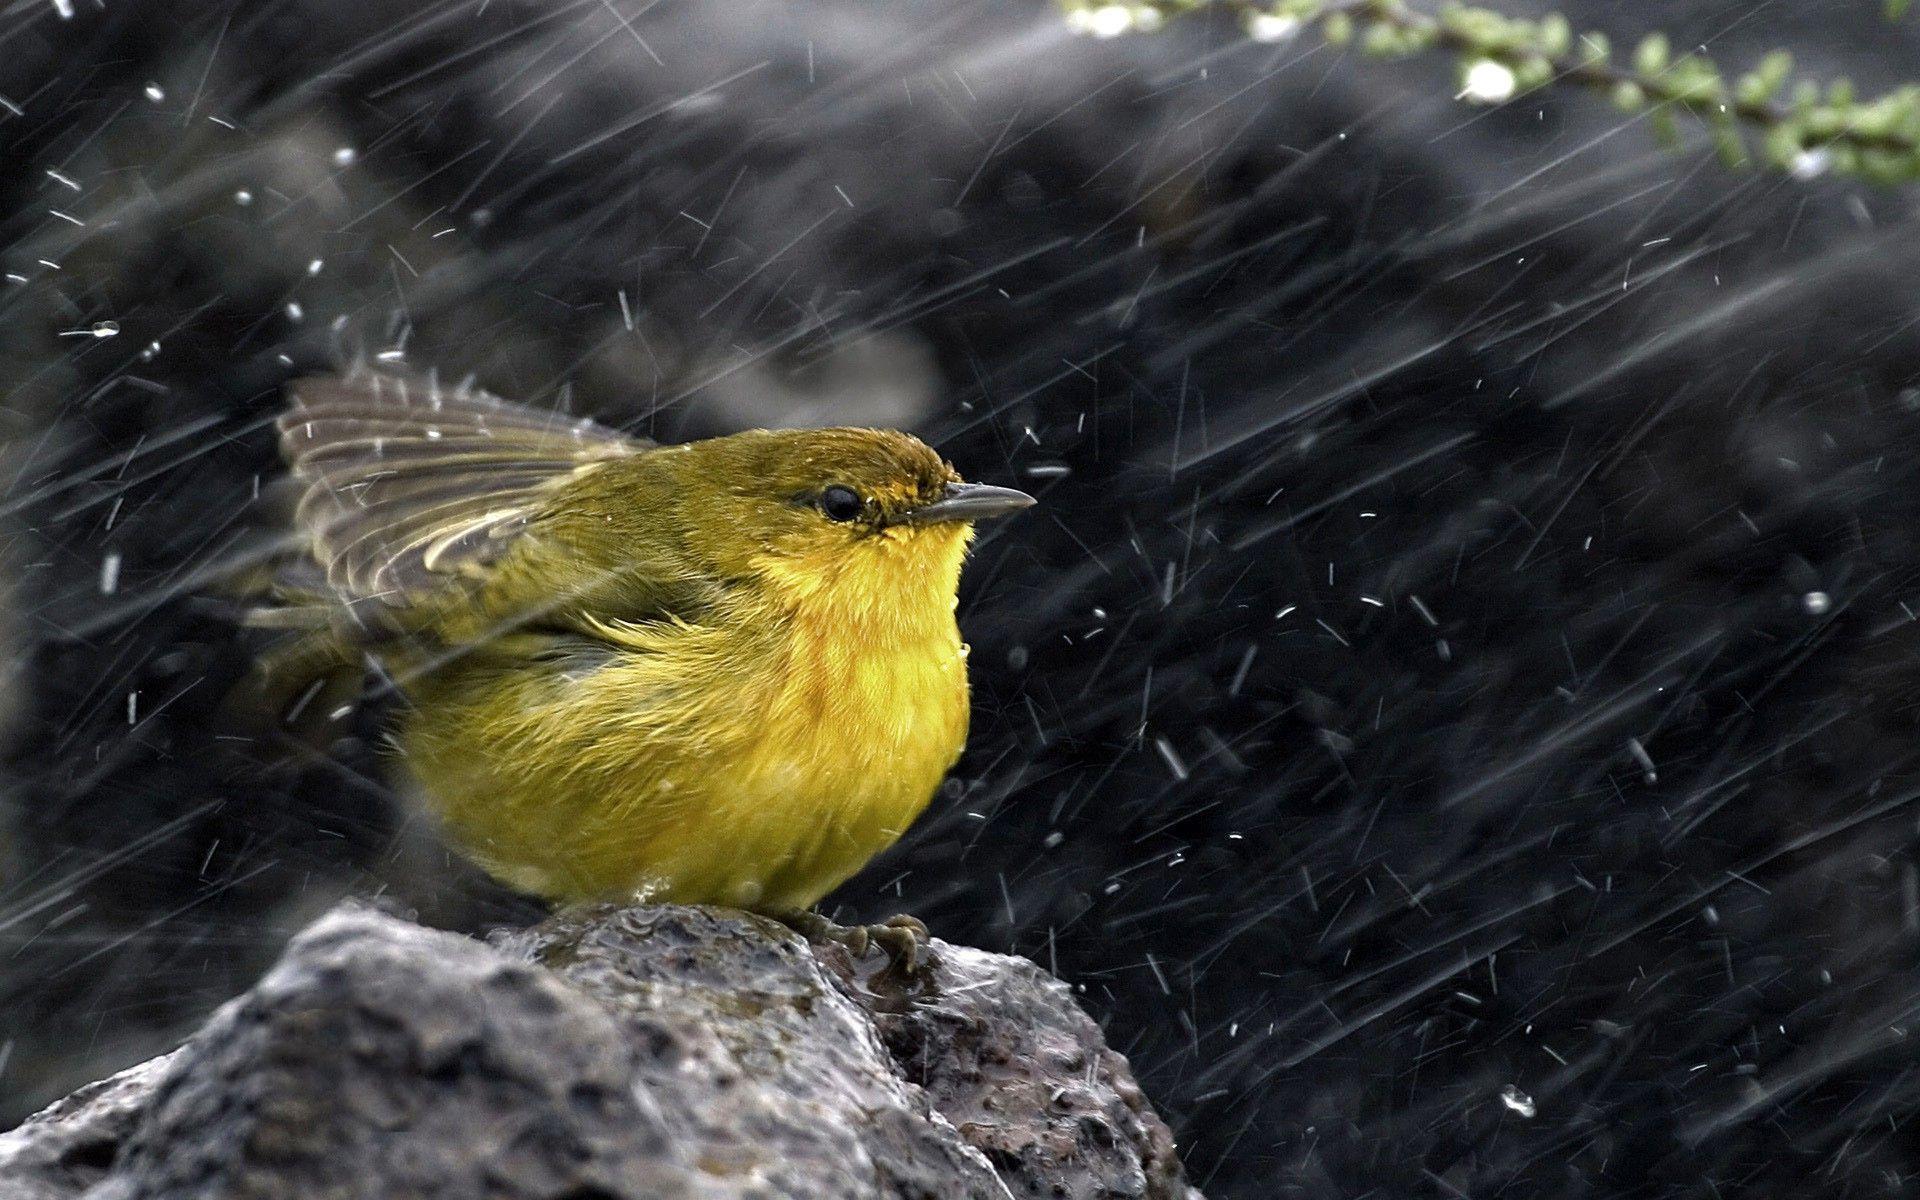 Bird On The Rain Wallpaper For PC #9304 Wallpaper | High ...